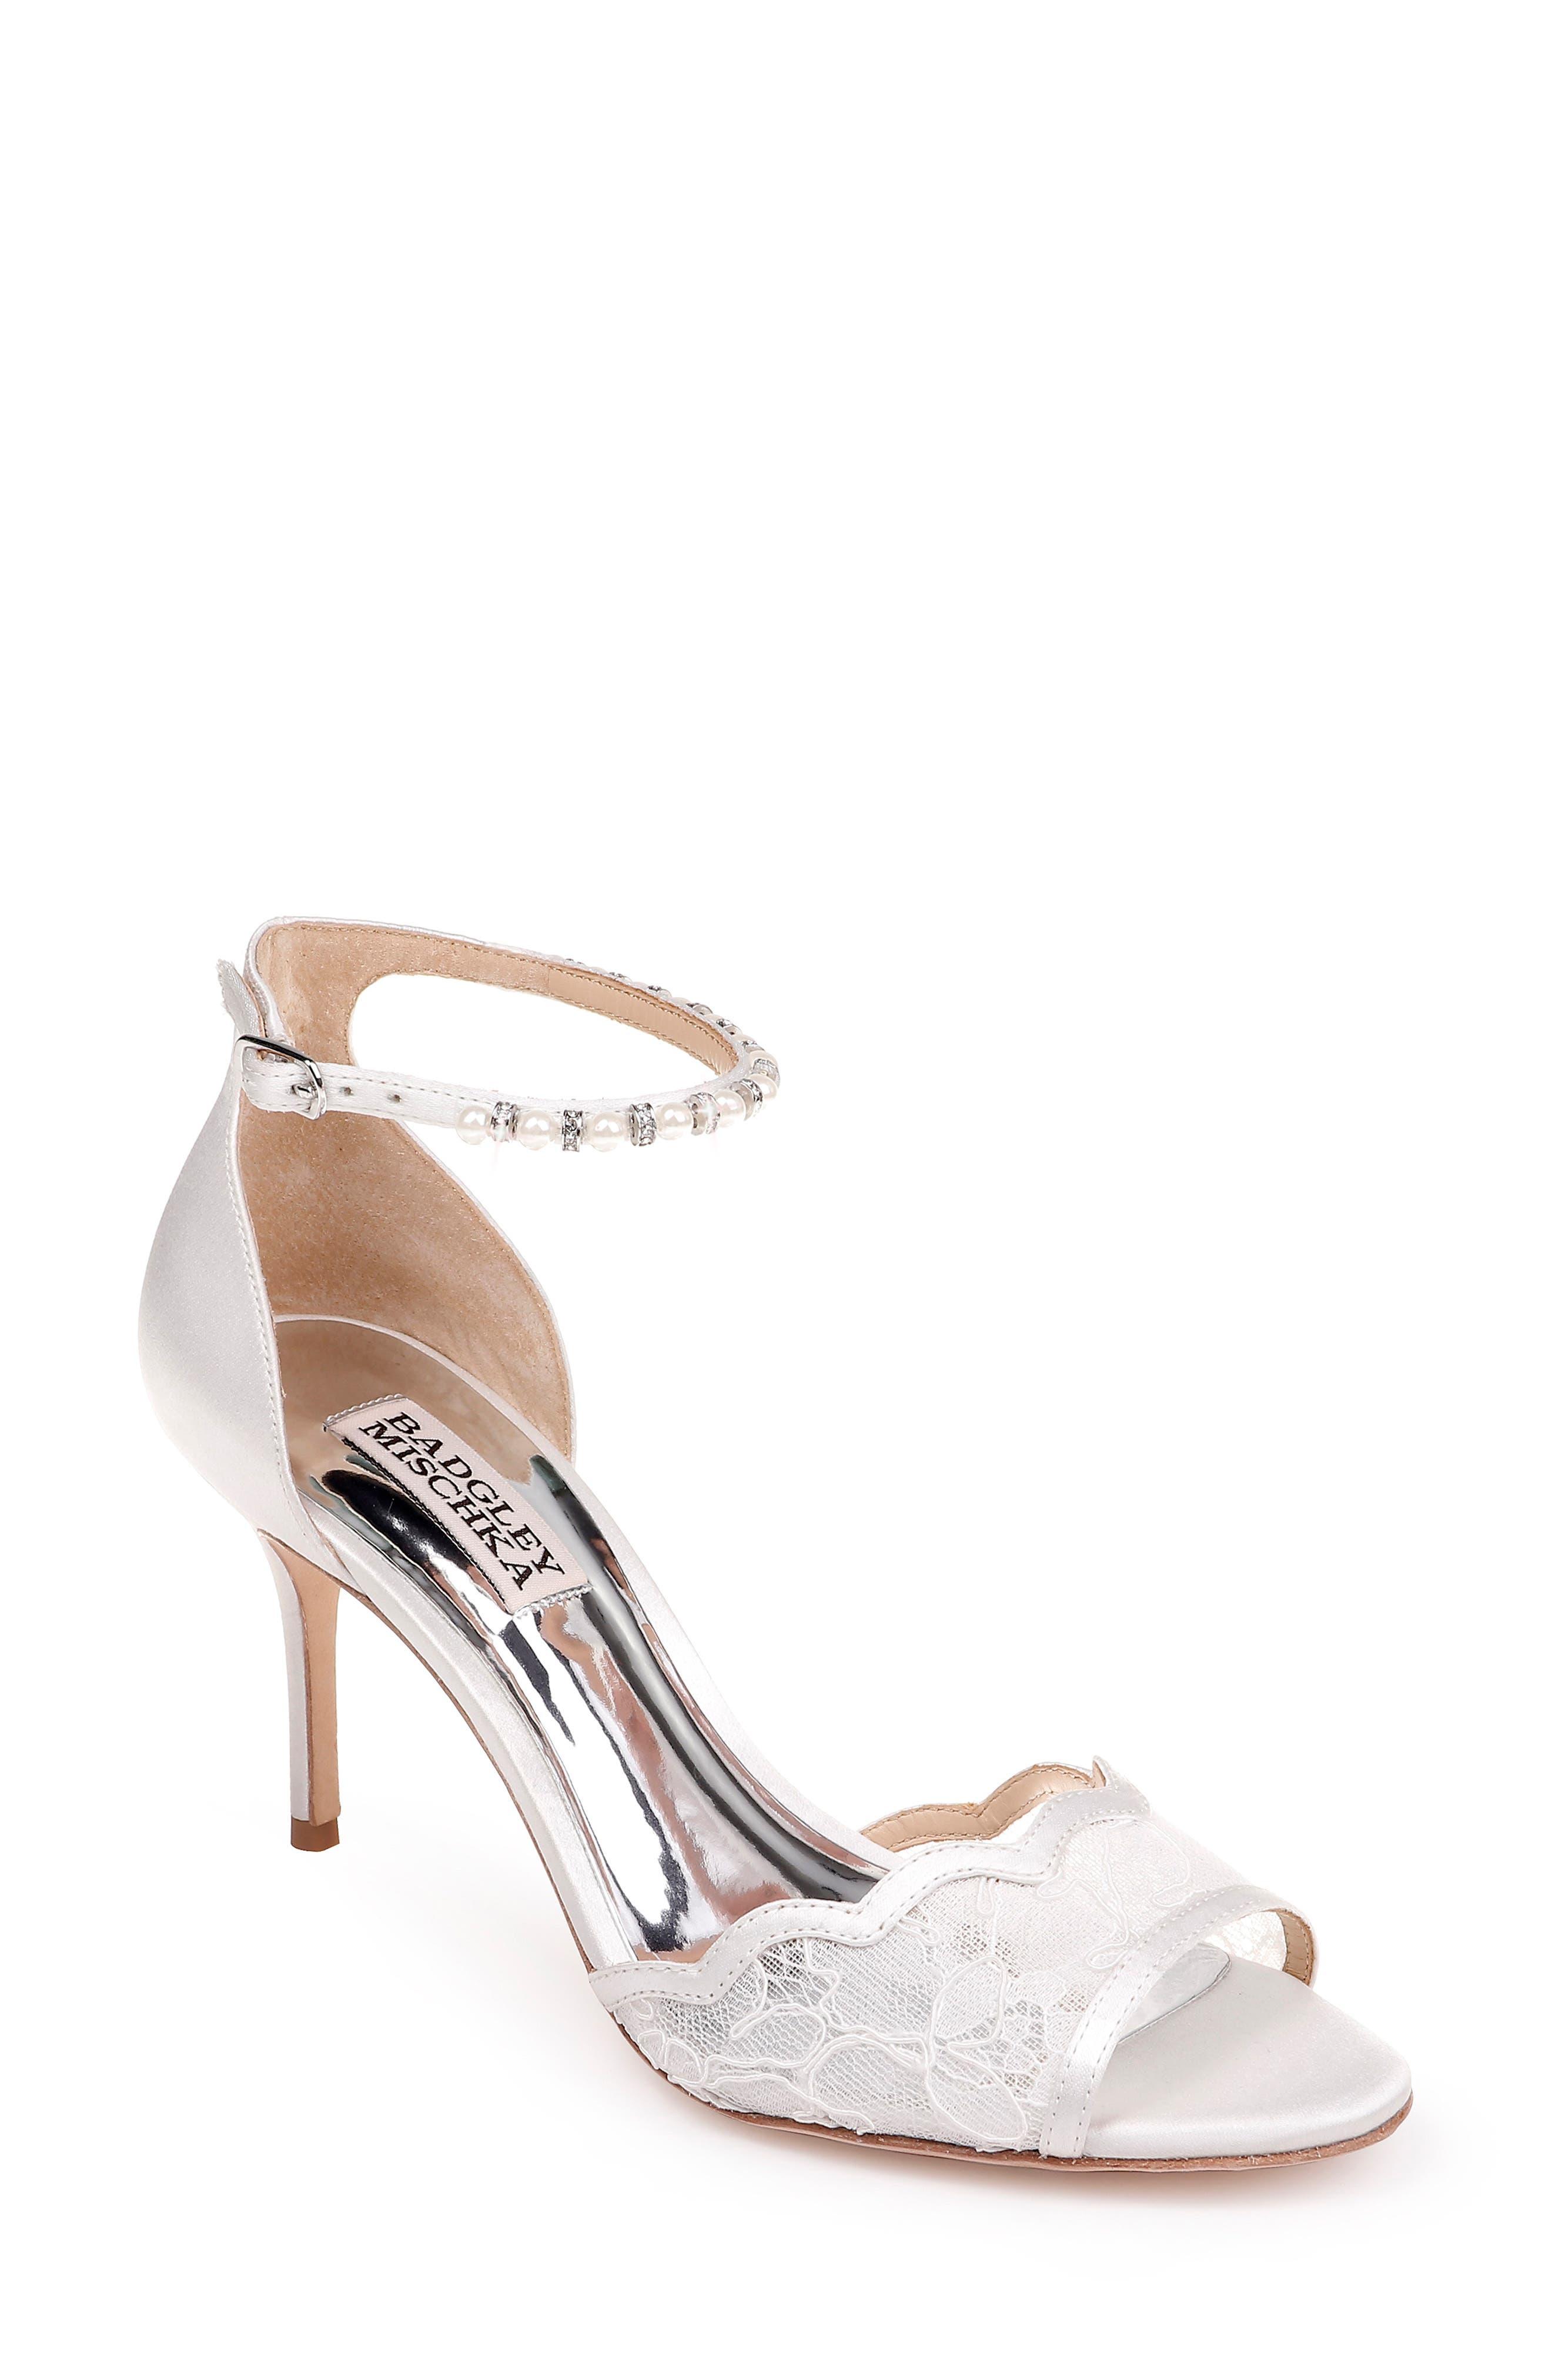 BADGLEY MISCHKA COLLECTION,                             Badgley Mischka Lenora Ankle Strap Sandal,                             Main thumbnail 1, color,                             SOFT WHITE FABRIC/ SATIN